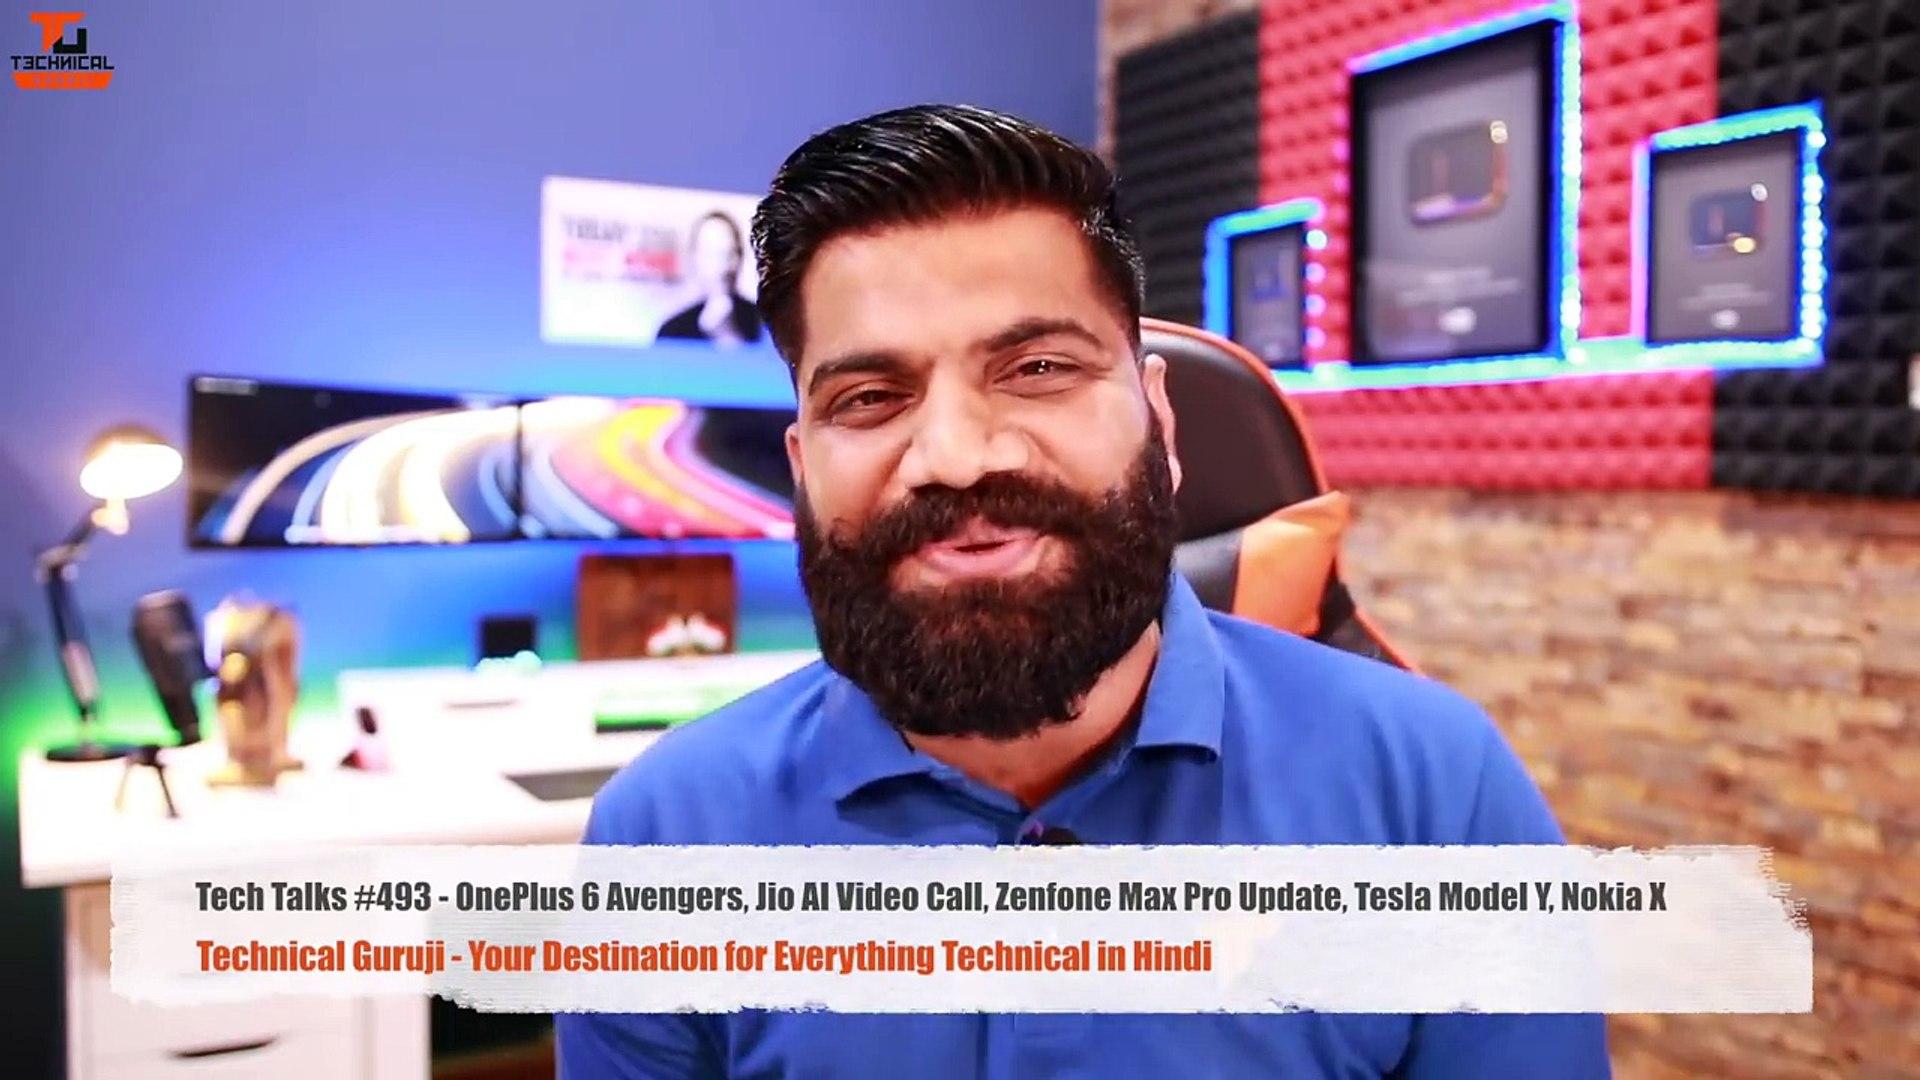 Tech Talks #493 - OnePlus 6 Avengers, Jio AI Video Call, Max Pro Update,  Tesla Model Y, Nokia X Technical Guruji